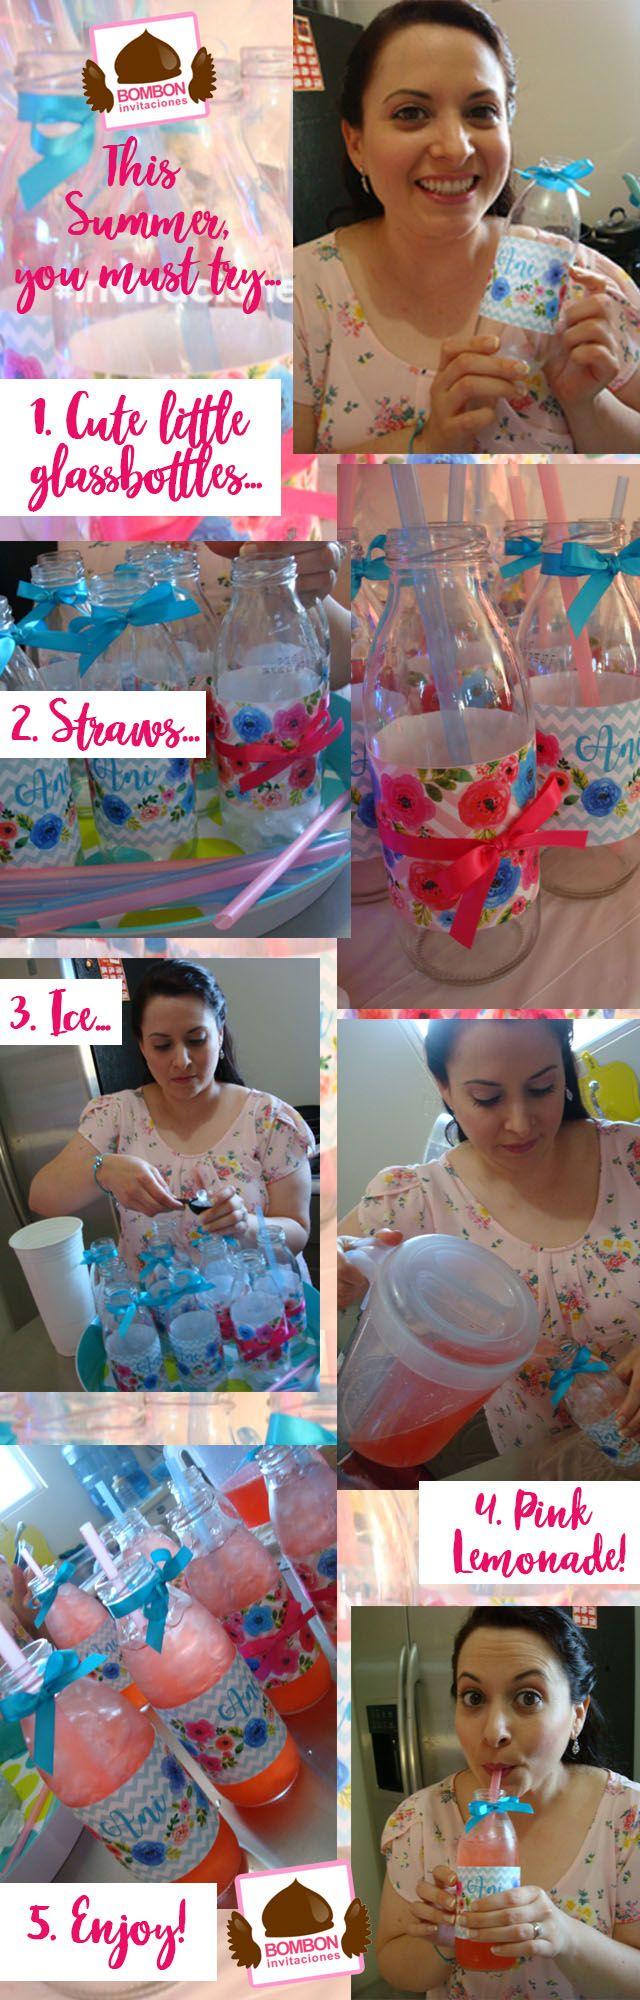 #Pinklemonade #pink #lemonade #summer #glassbottle #watercolor #flowers #glass #bottle #cute #little #blue #birthday #birthdaygirl #birthdayparty #label #straws #straw #party #water #ice #fresh #design #graphicdesign #invitacionesbombon https://www.facebook.com/InvitacionesBOMBONLANDIA/